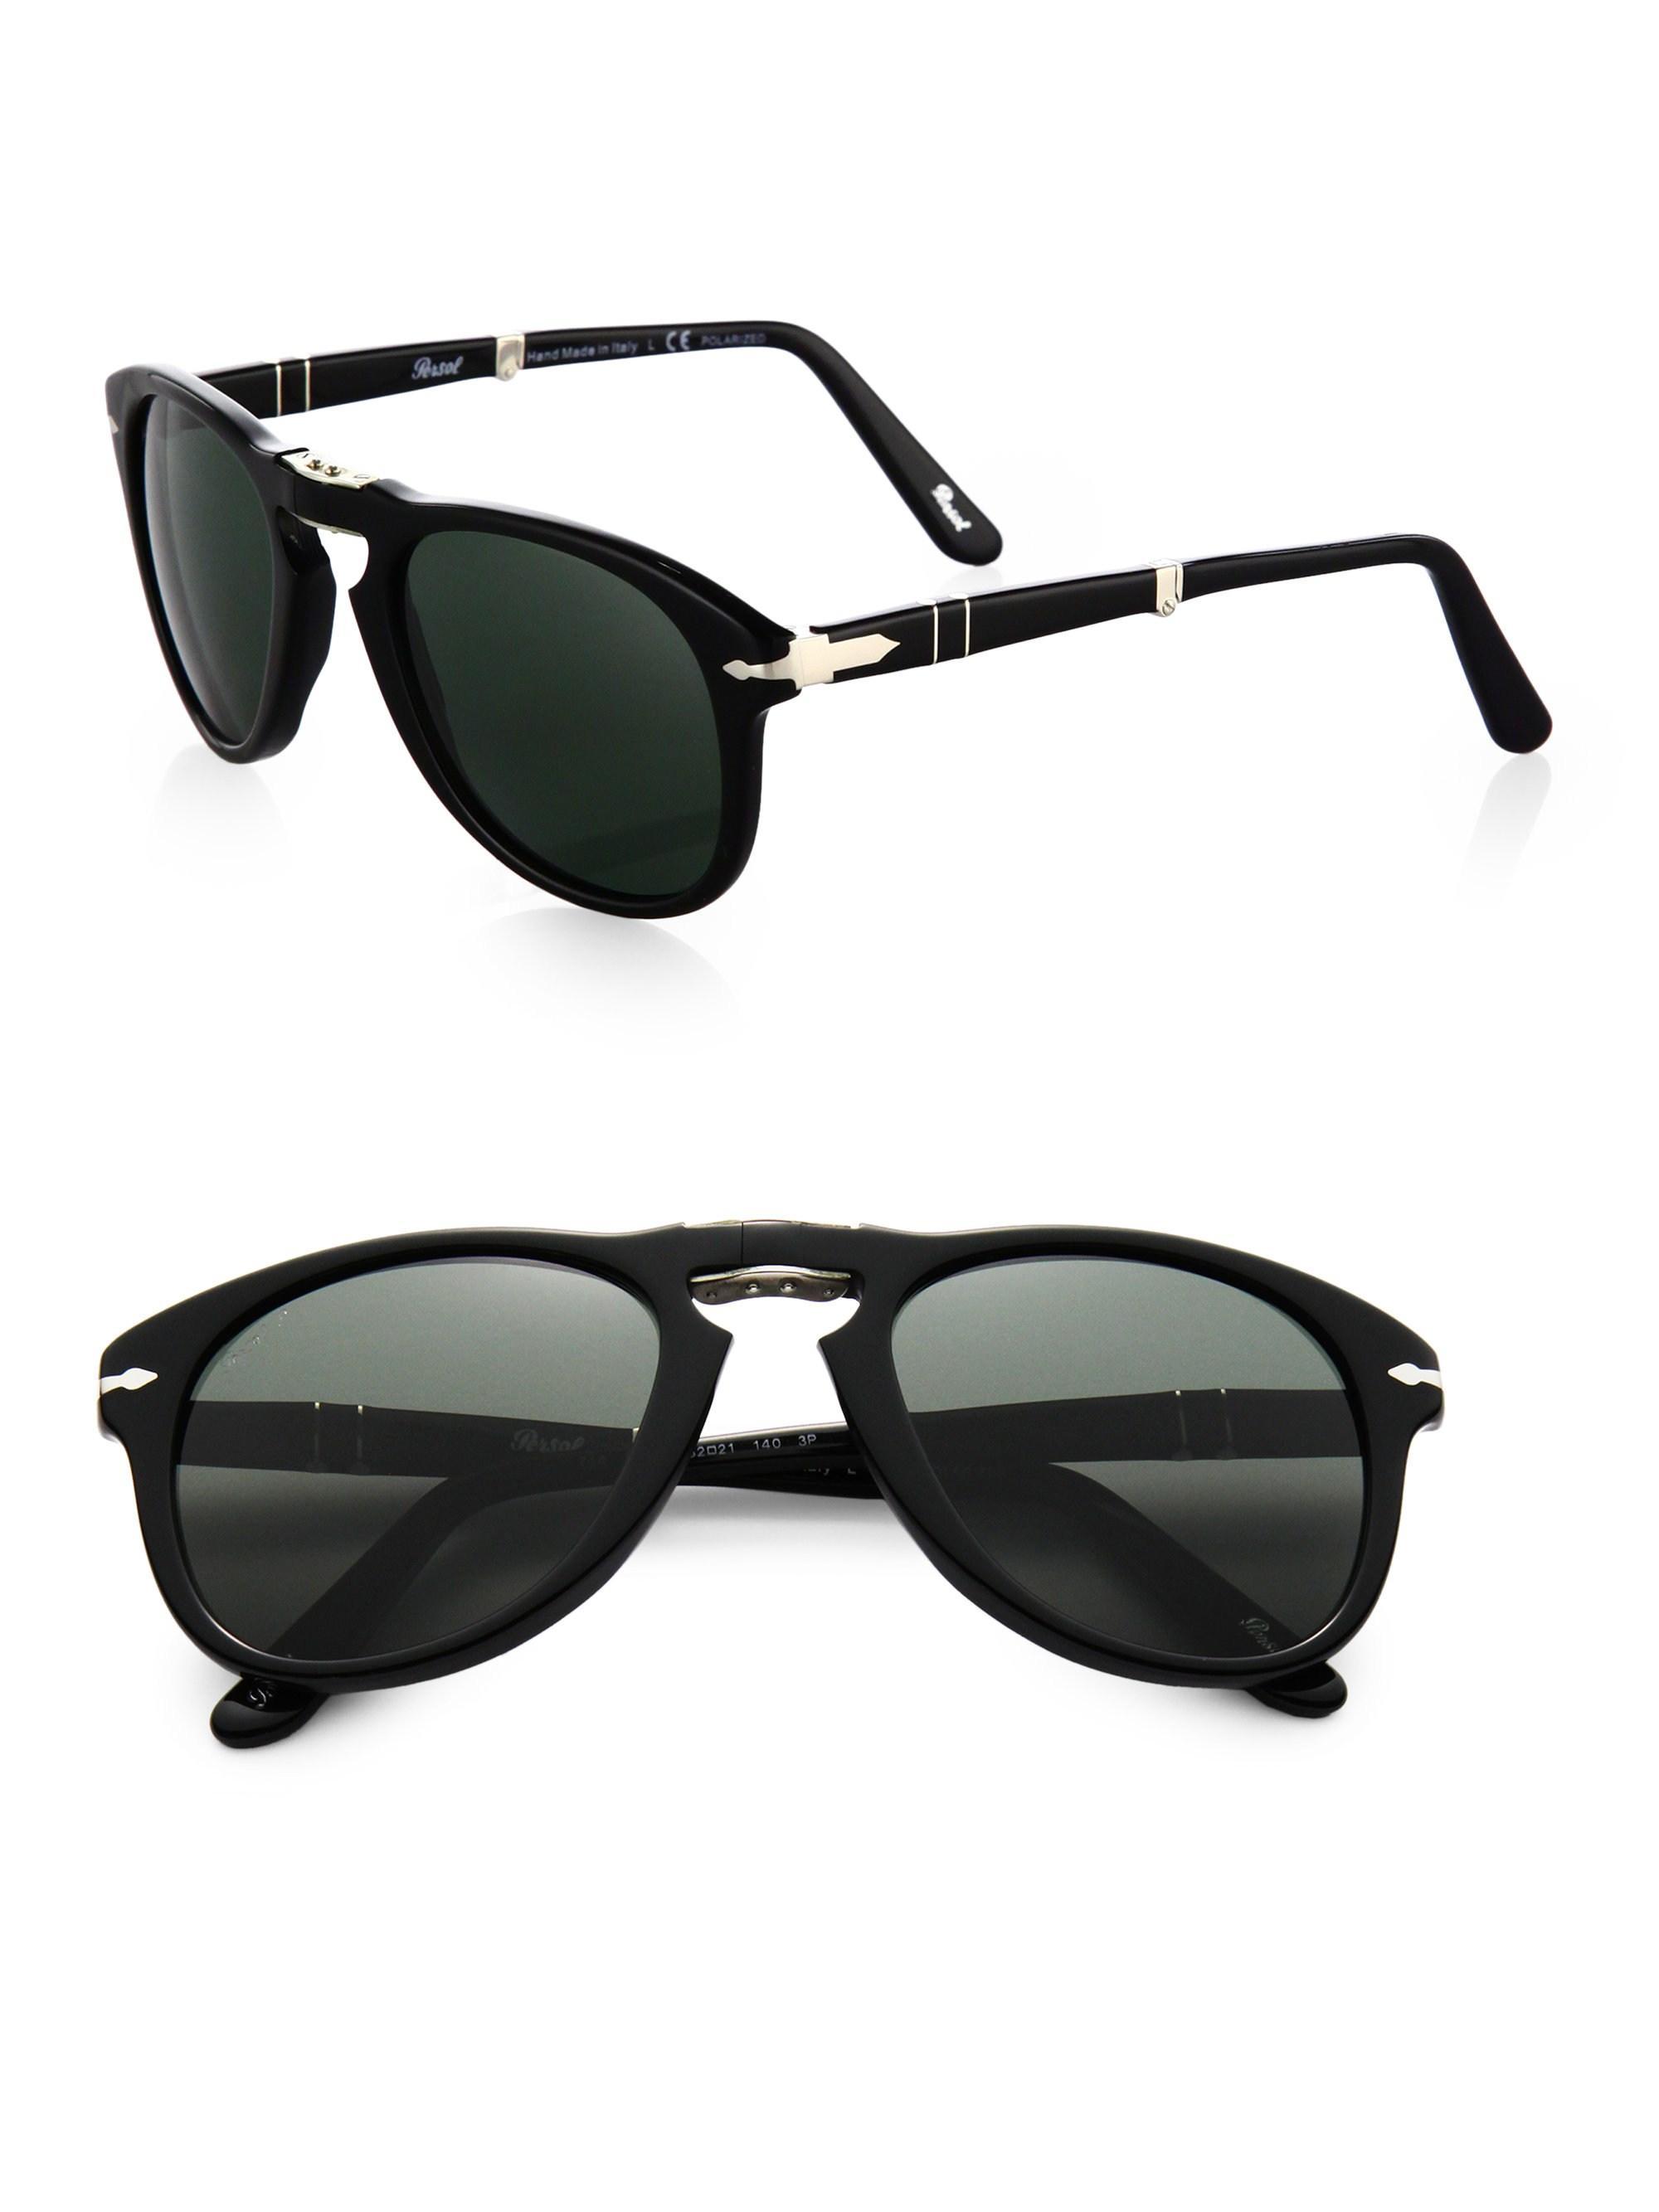 1dc421e3be Lyst - Persol Folding Keyhole Plastic Sunglasses in Black